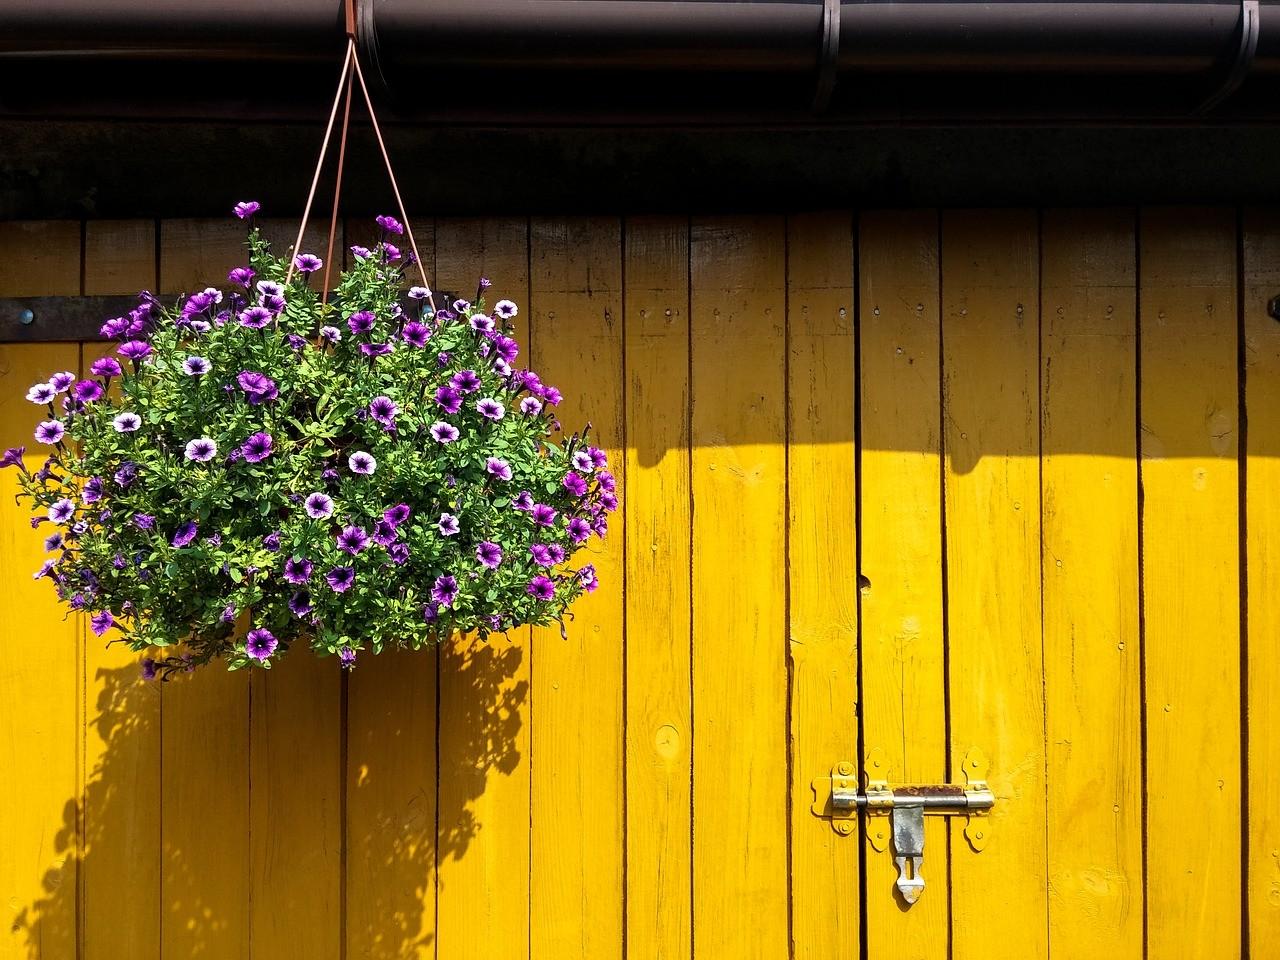 10 Small Backyard Landscaping Ideas - A Green Hand